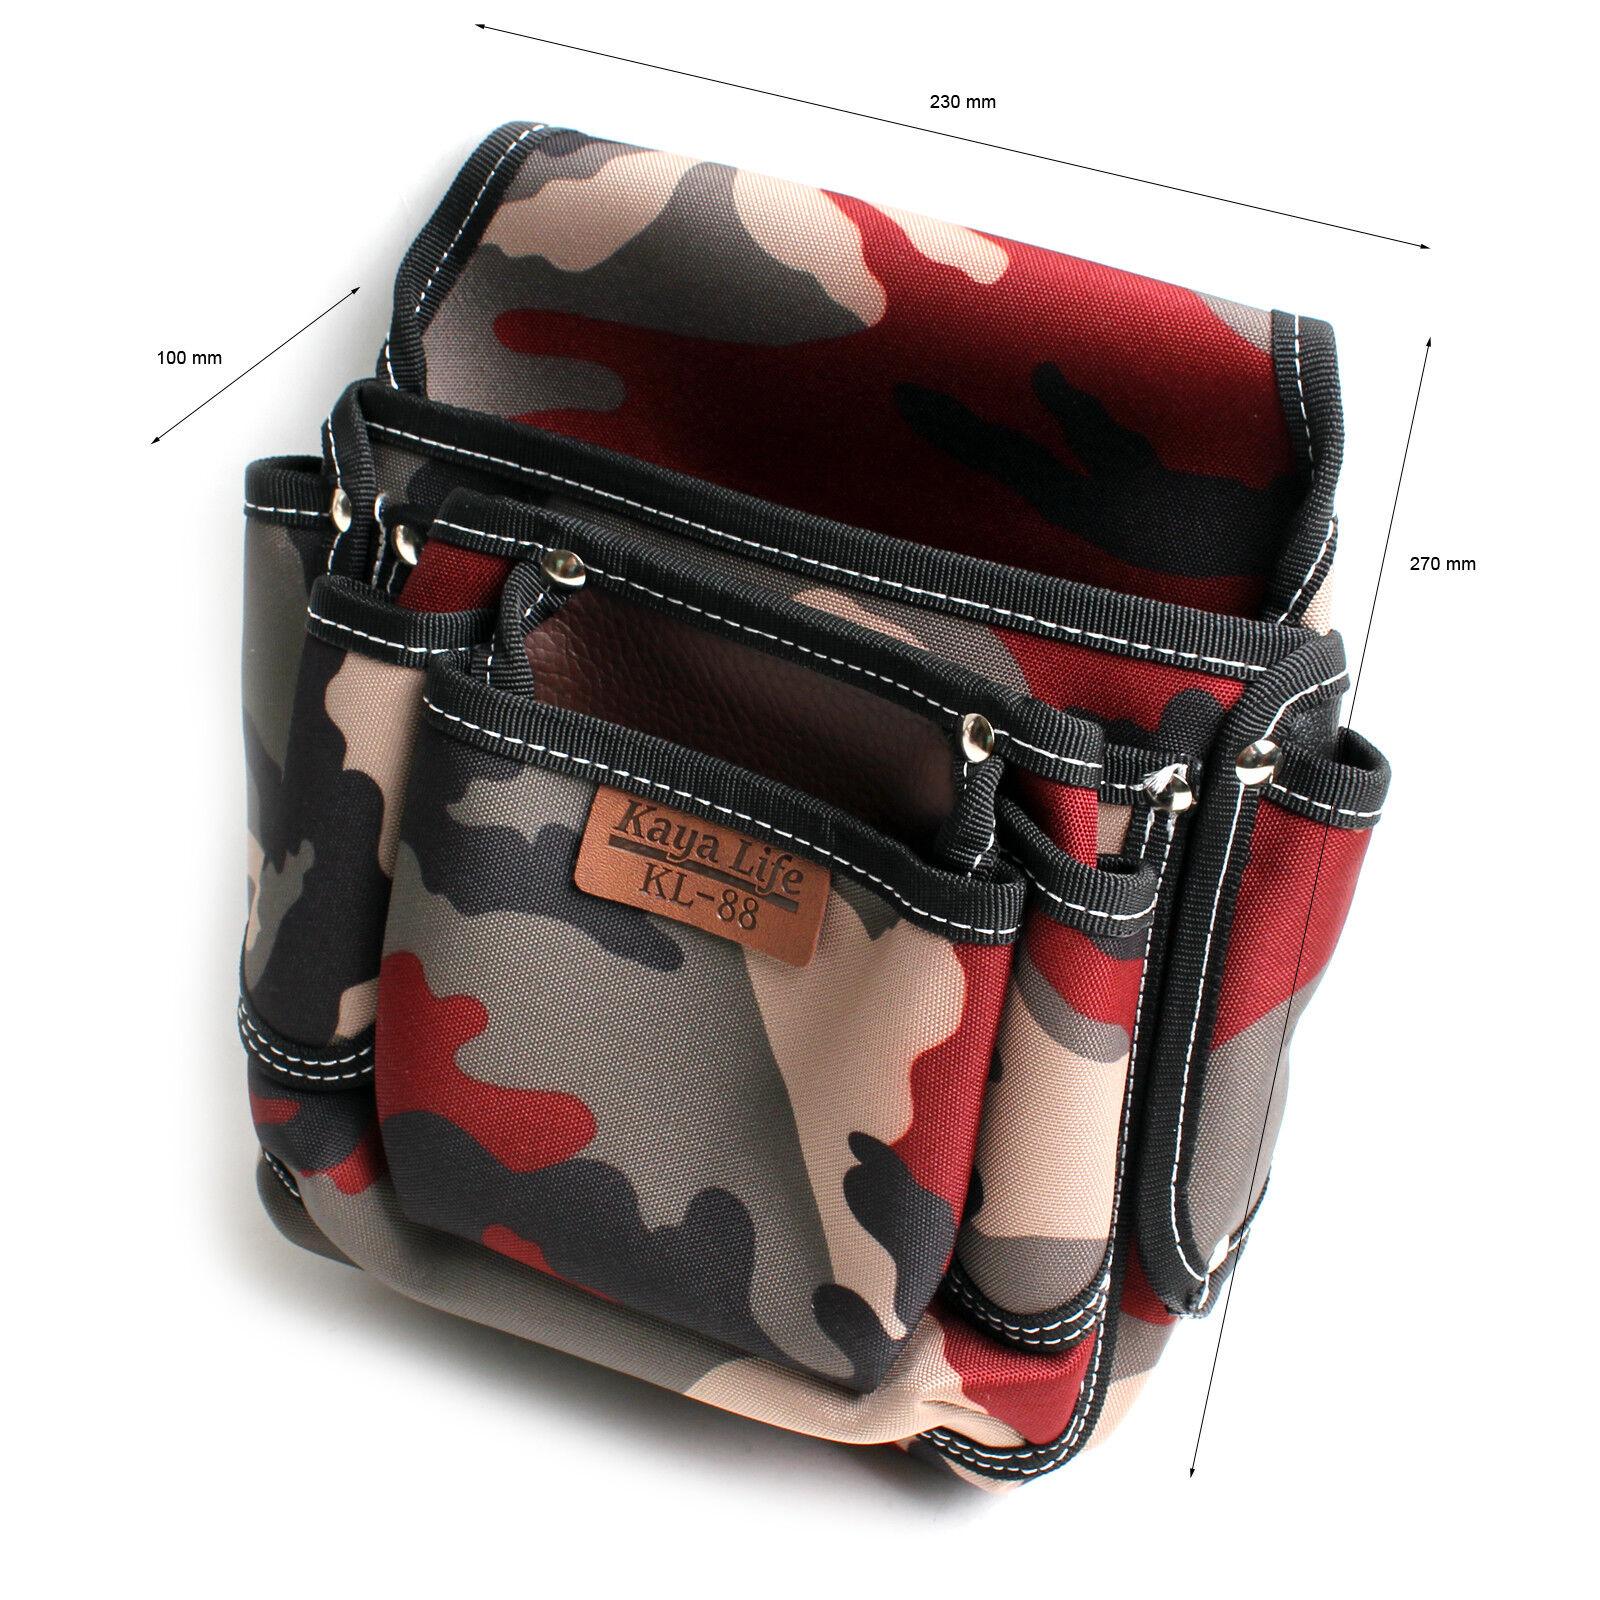 Tool Bag Pouch for Screws Nails Hammer Tool Belt Holder Polyester KL-88 KOREA